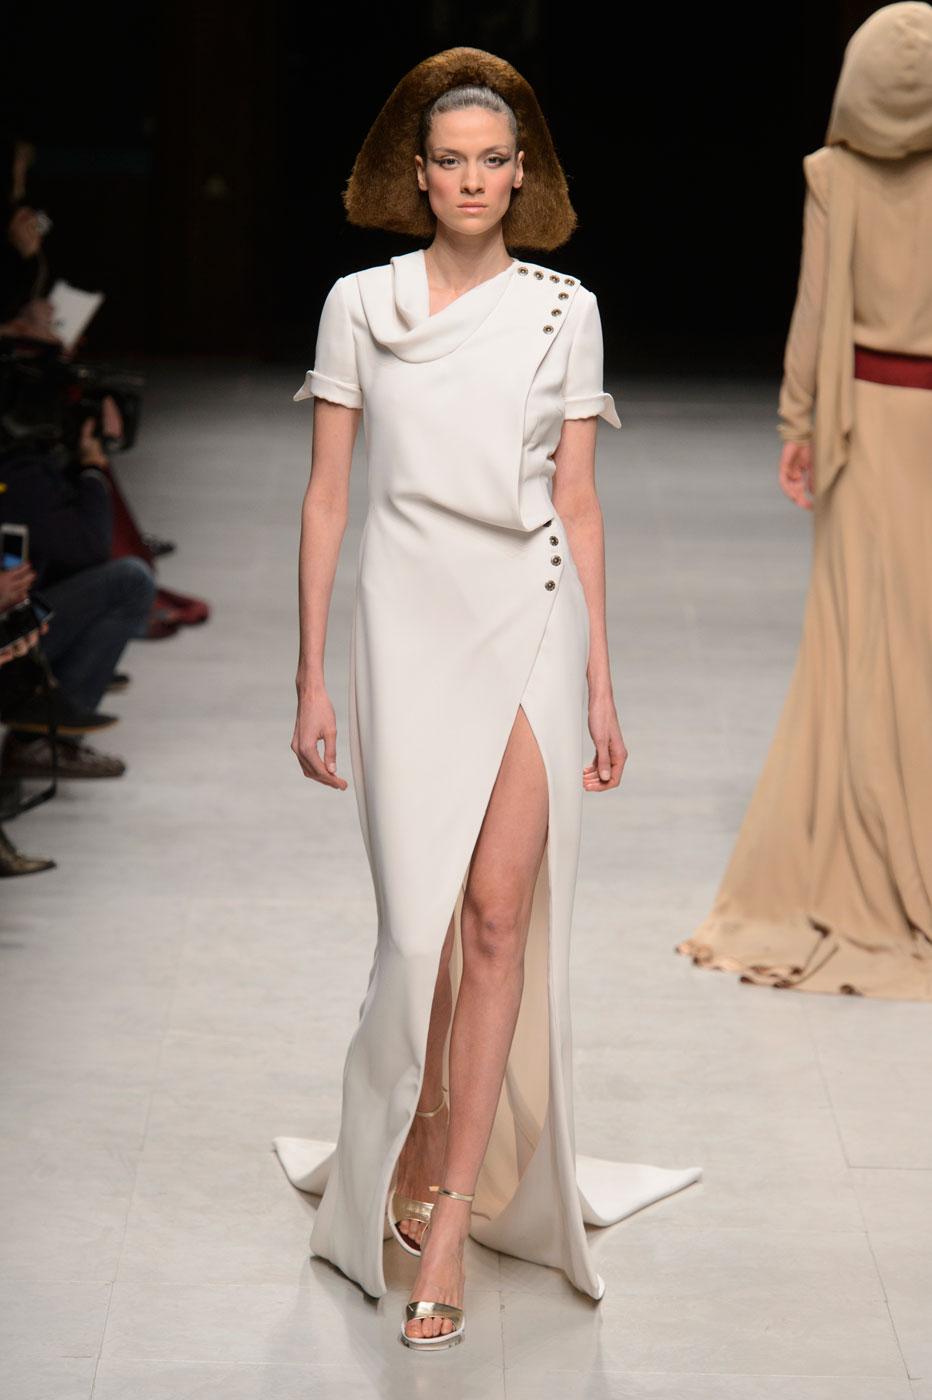 Julien-Fournie-Prive-fashion-runway-show-haute-couture-paris-spring-2015-the-impression-28